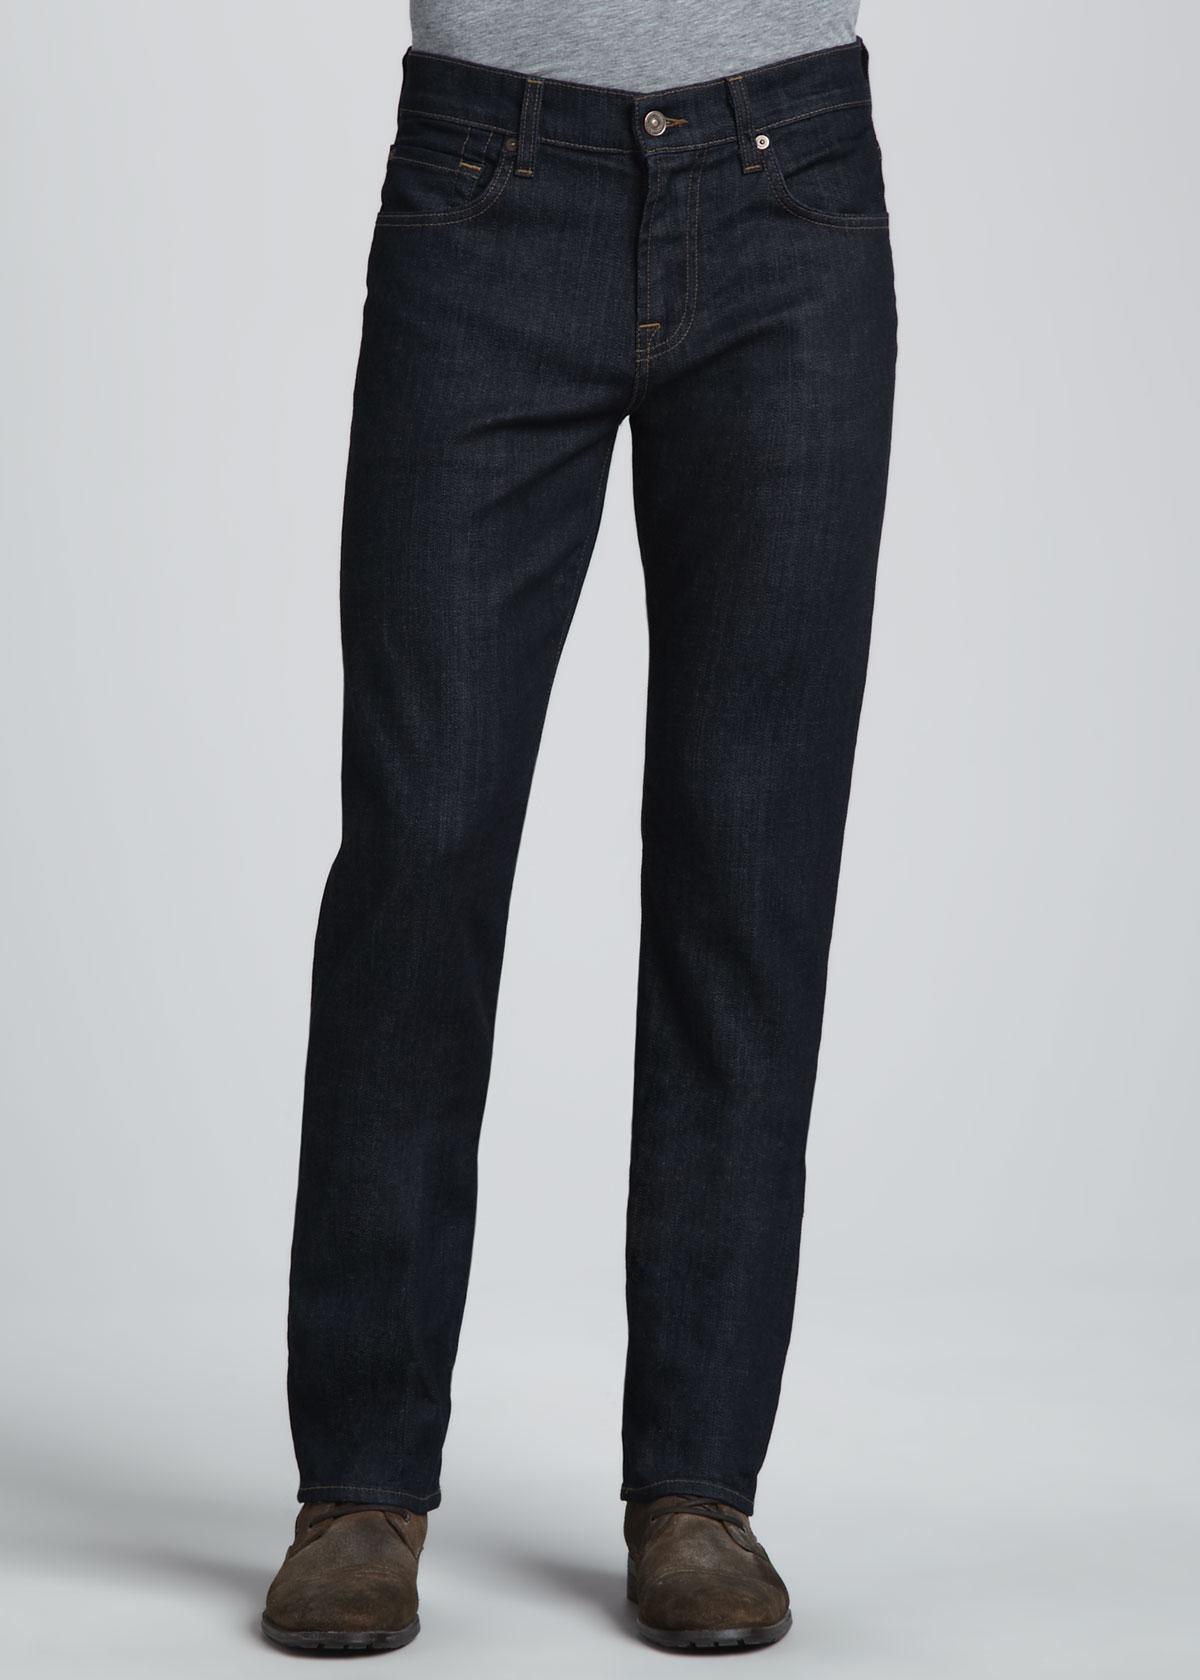 7 for all mankind carsen dark clean jeans in blue for. Black Bedroom Furniture Sets. Home Design Ideas